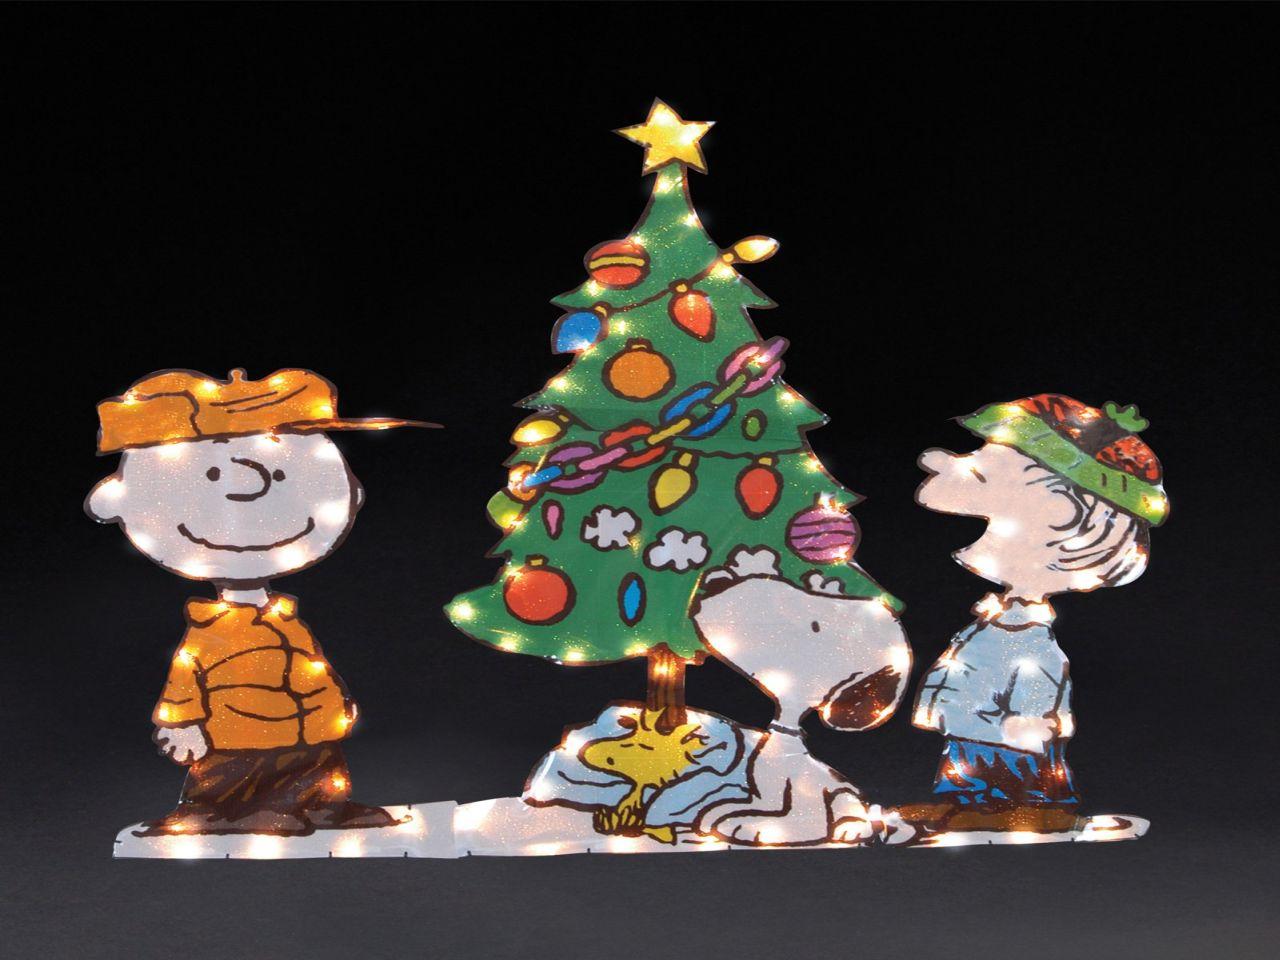 Charlie Brown Christmas Wallpaper Wallpaper Mansion 1280x960